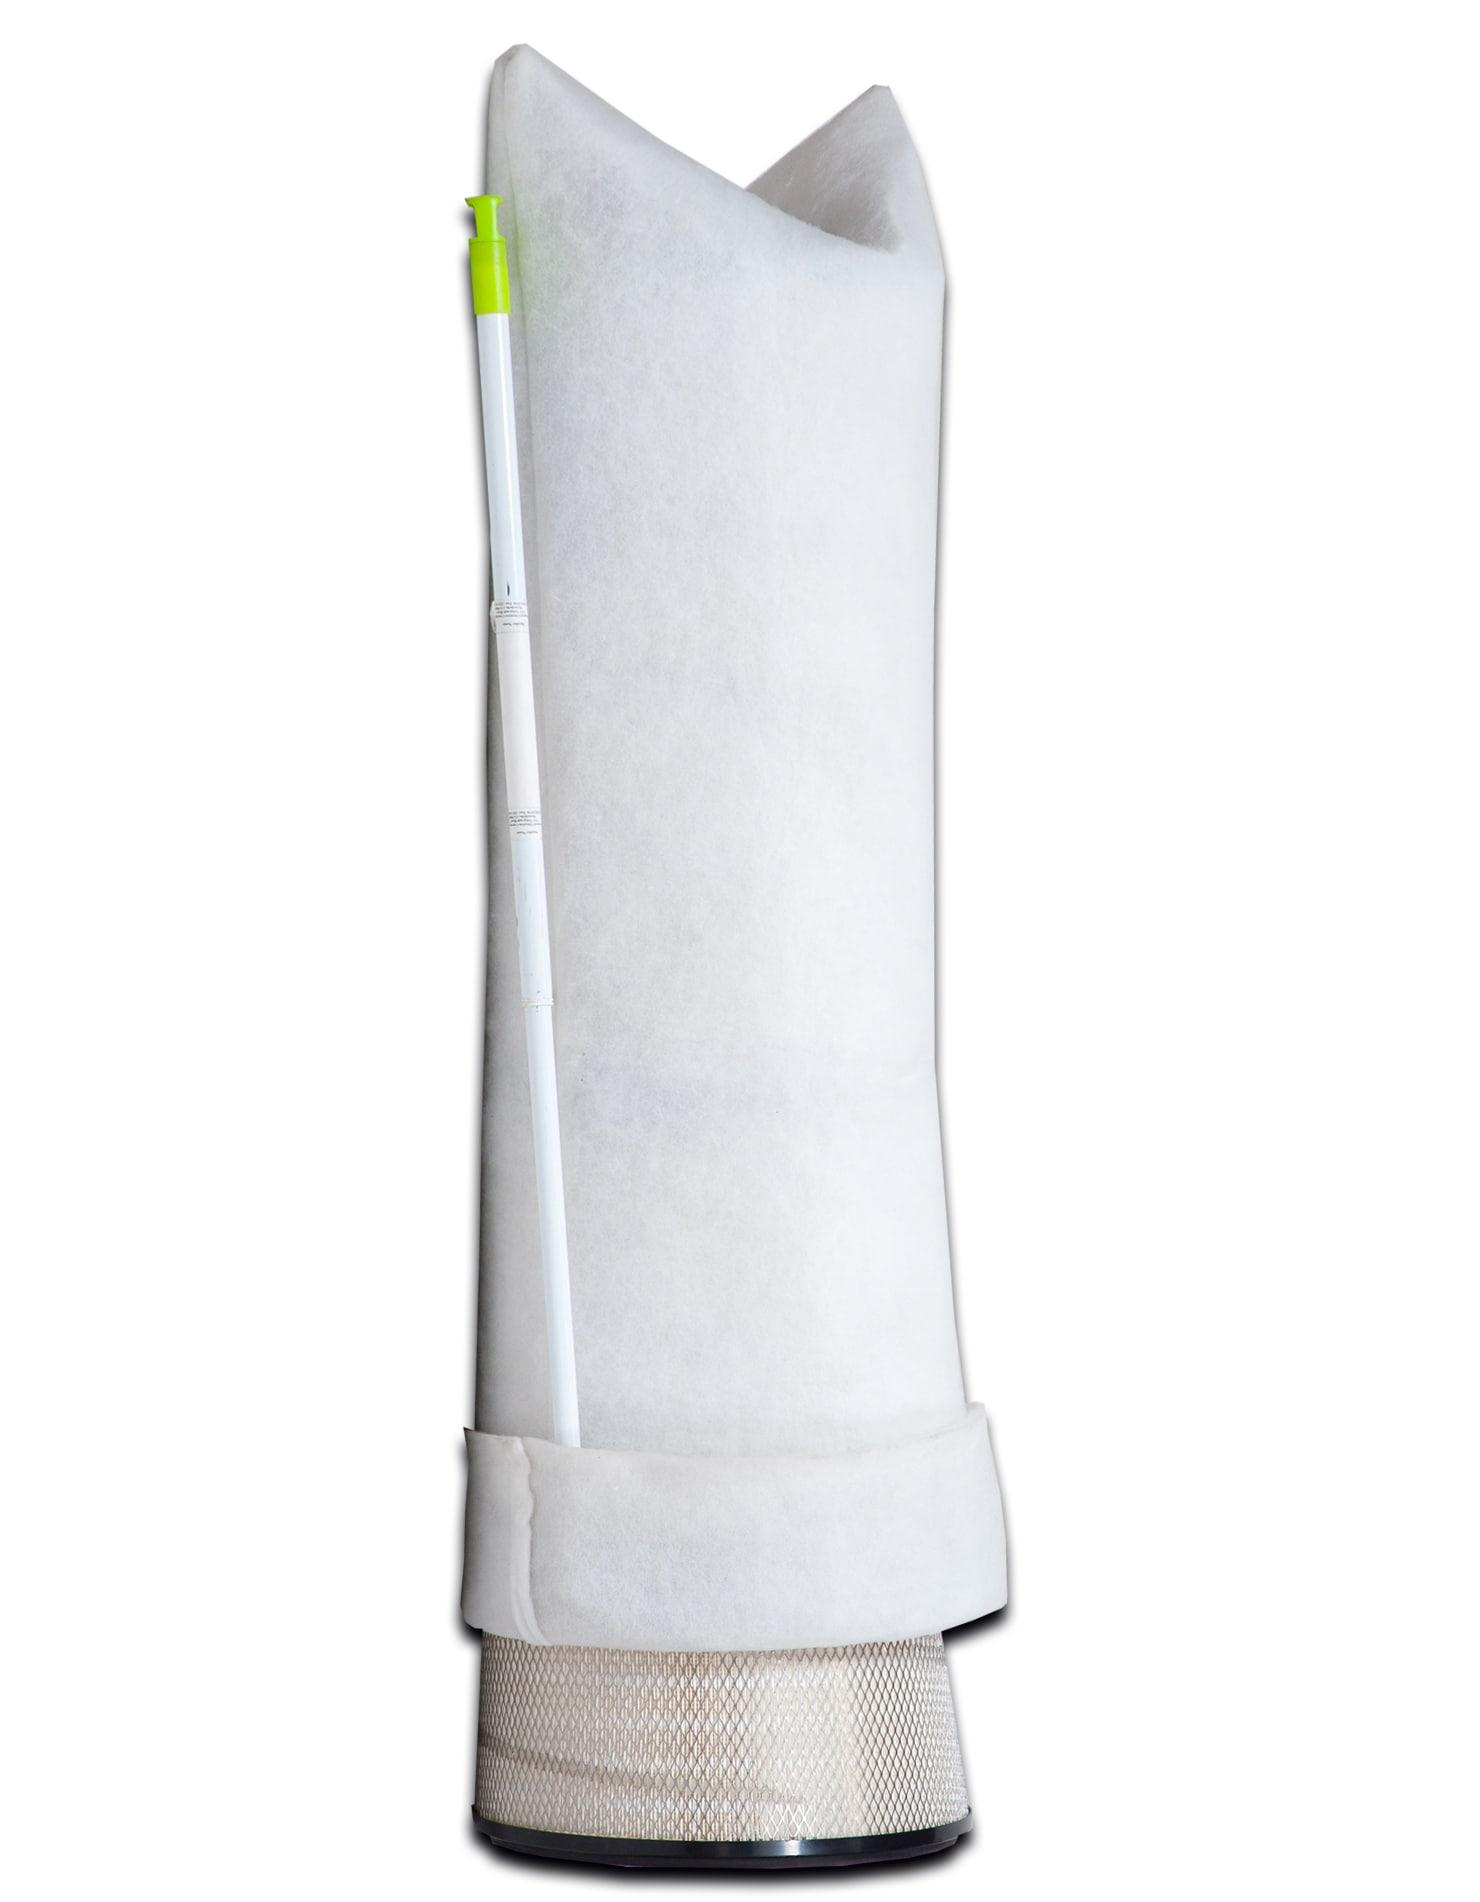 GDX/GDS Polyester Pre-Filter Wrap